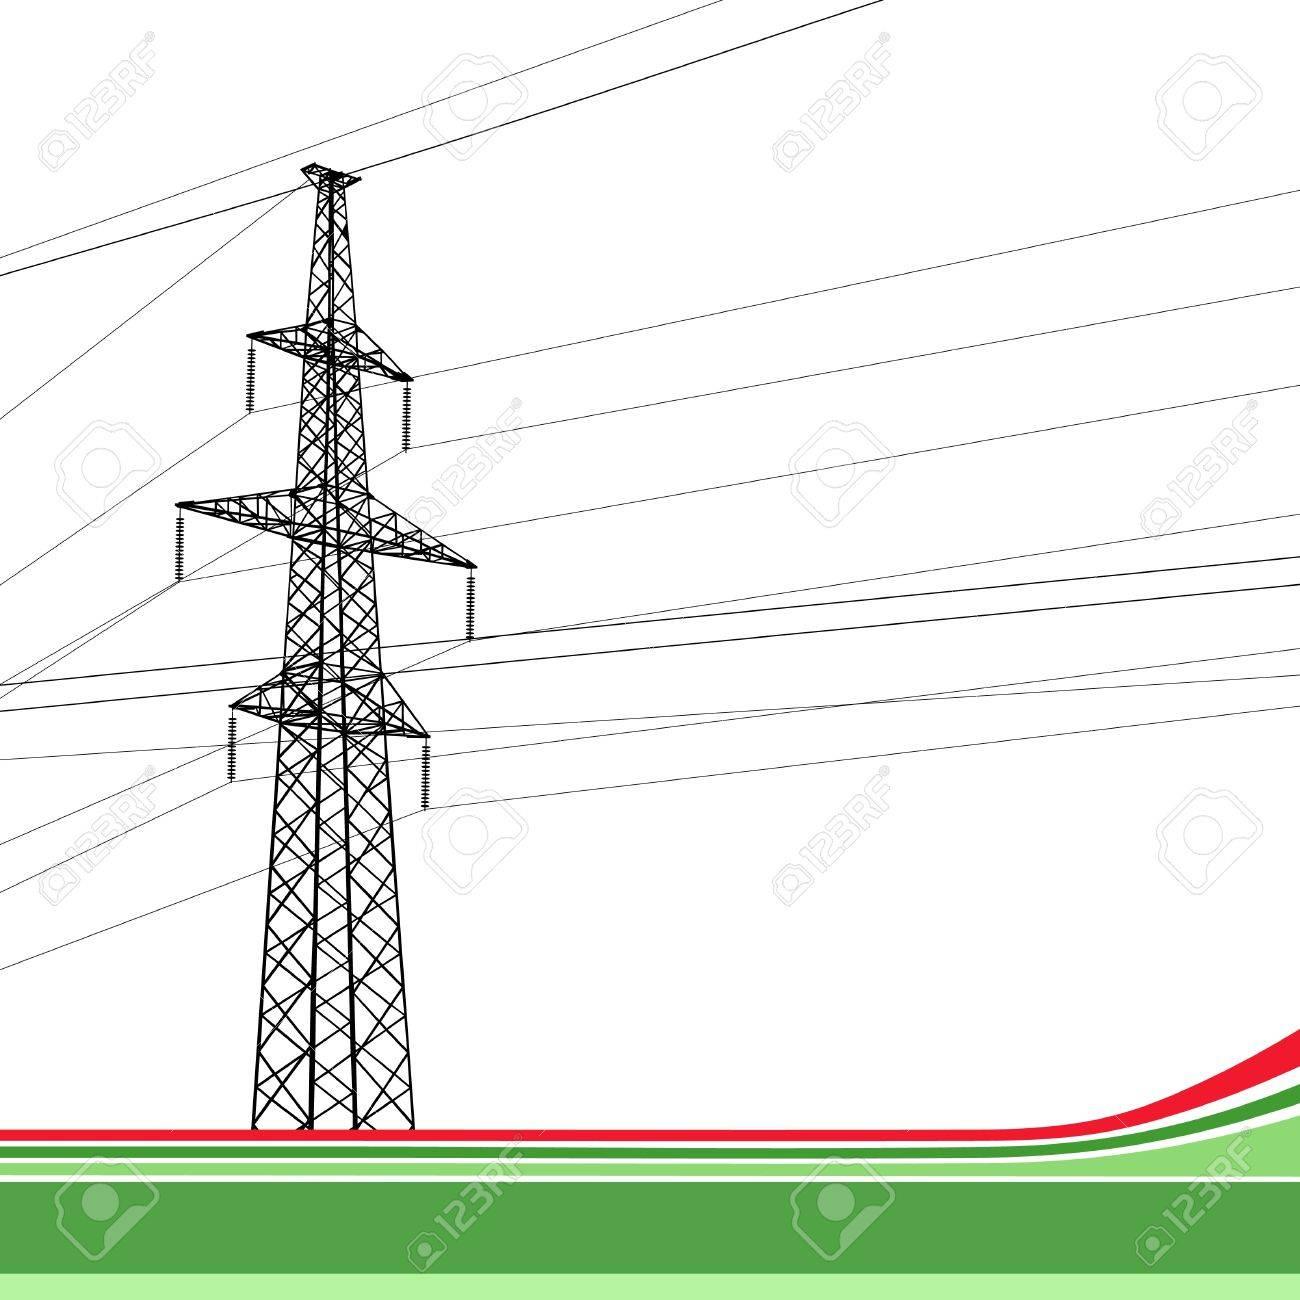 Power Tower High Voltage